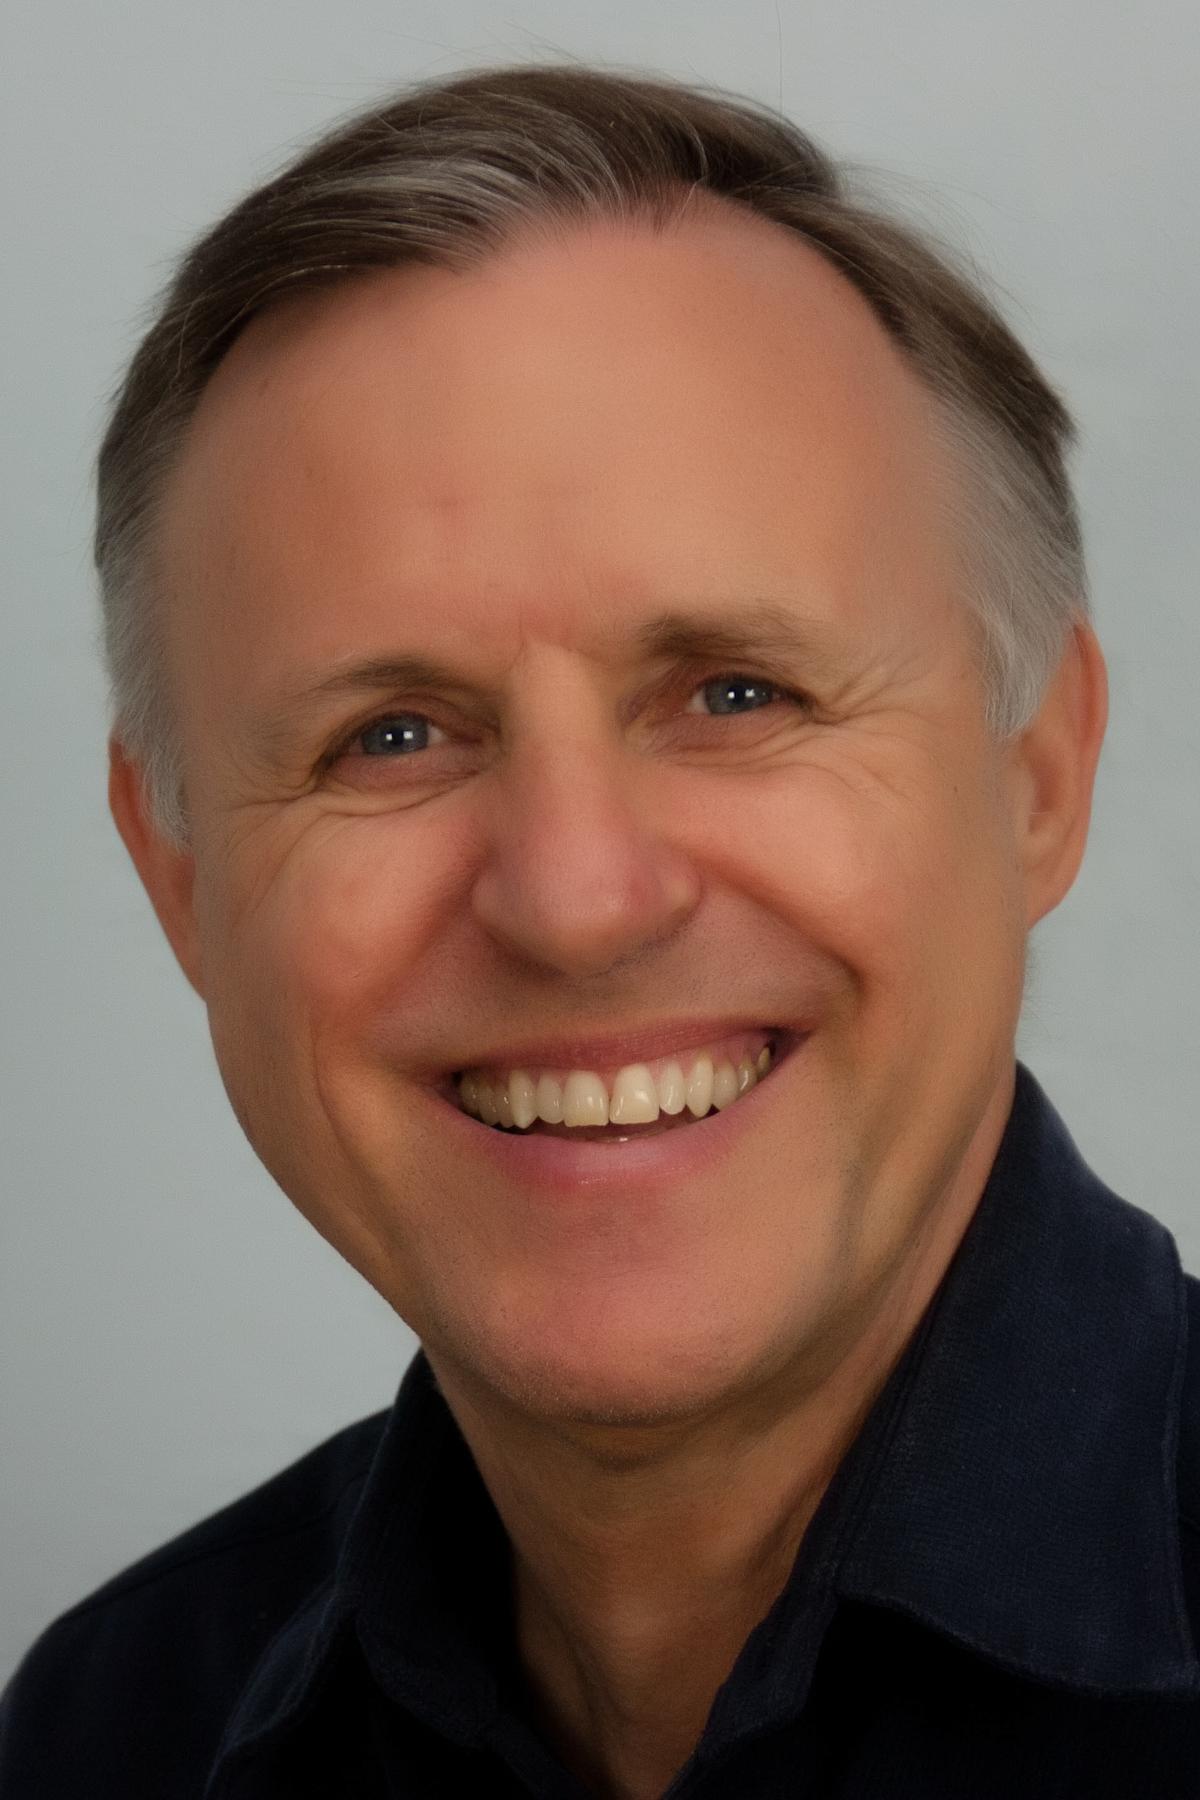 Randy Kirk 2014 Inspirery interview